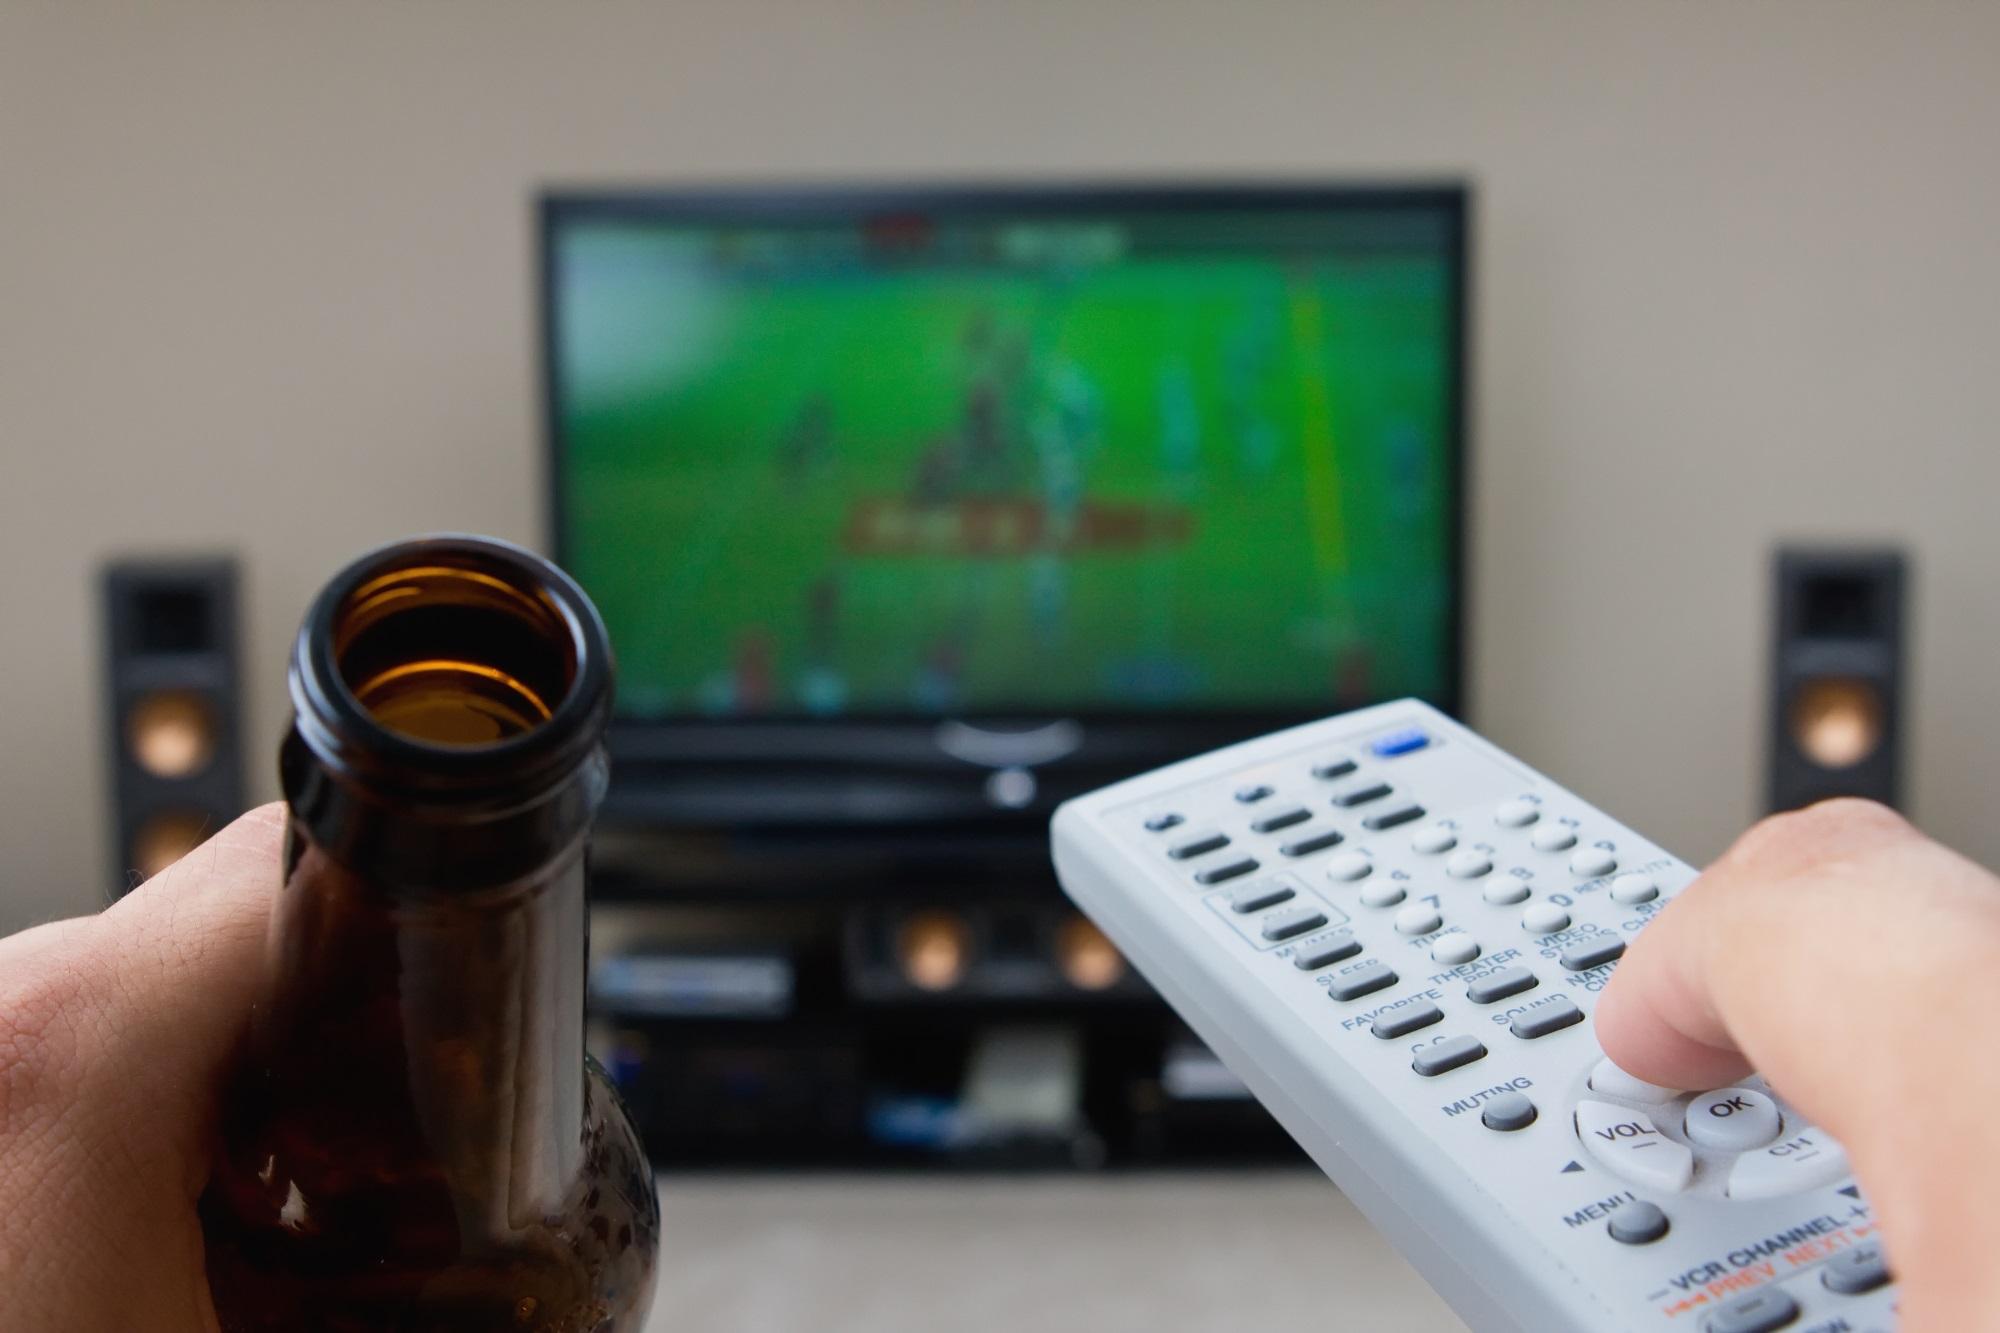 Adobe: US Online TV Consumption up 246% in Q1 2014